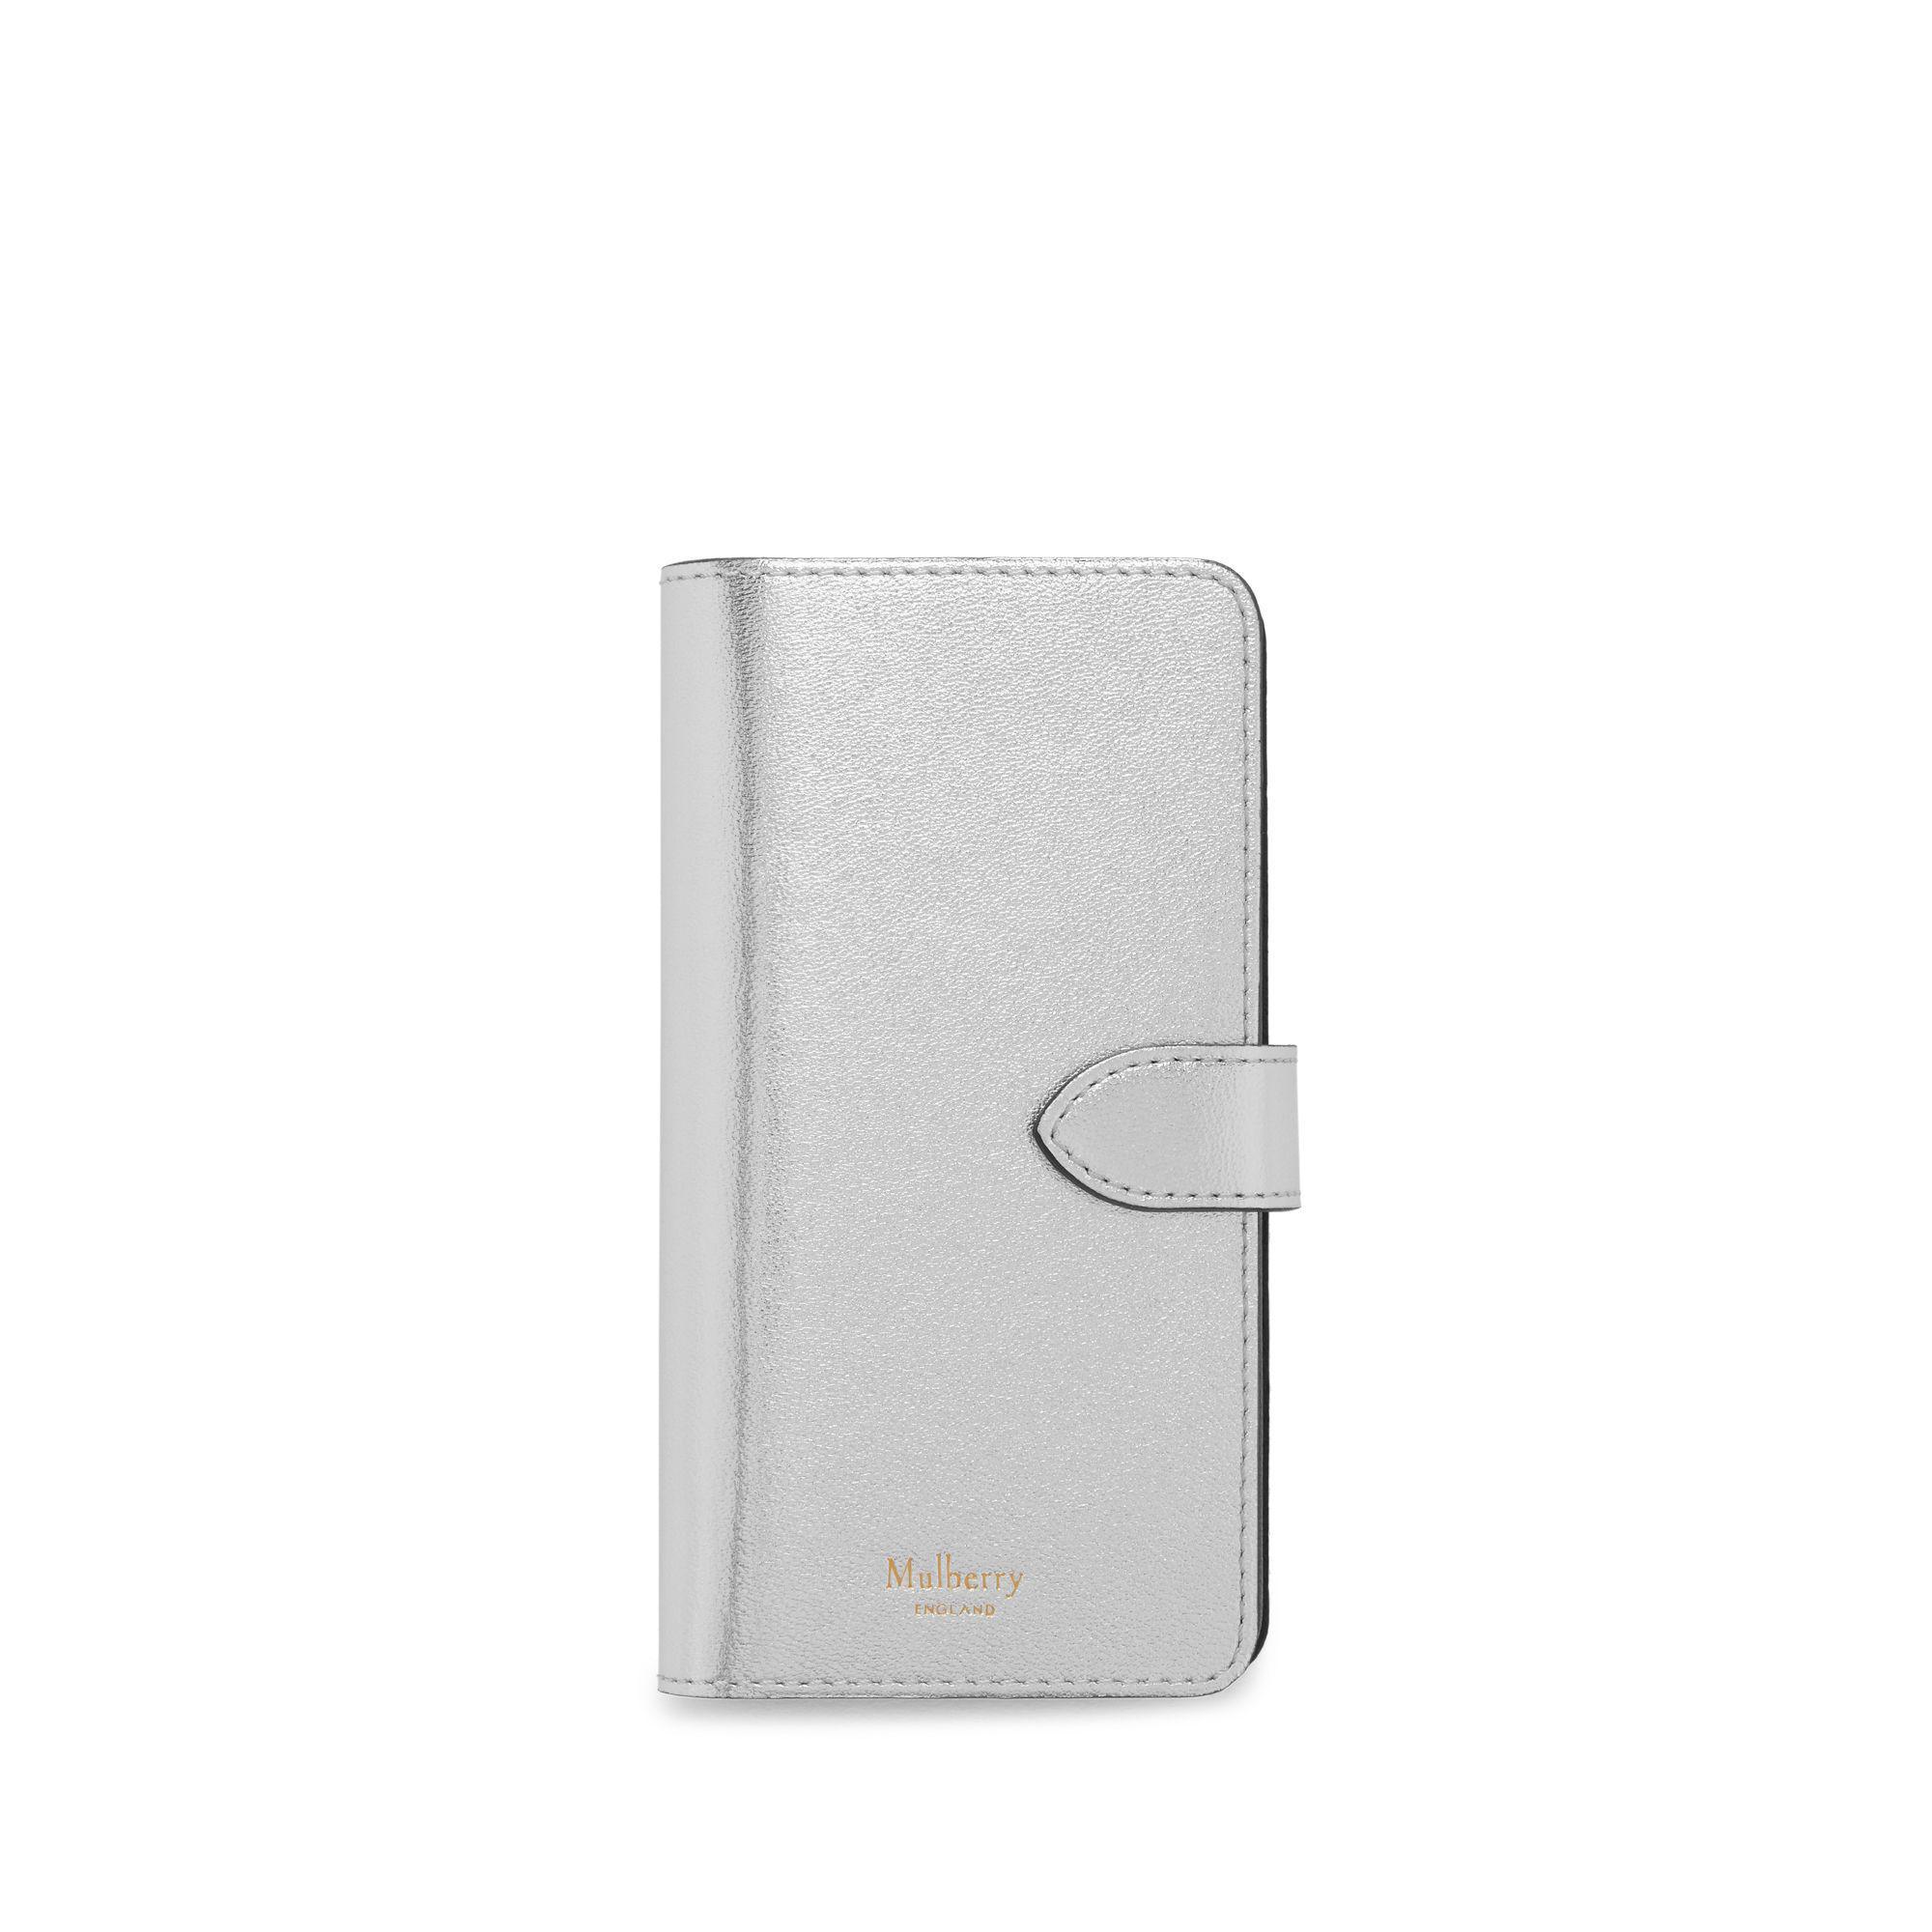 70cf175a7b28 Mulberry - Iphone Flip Case In Light Silver Metallic Nappa - Lyst. View  fullscreen